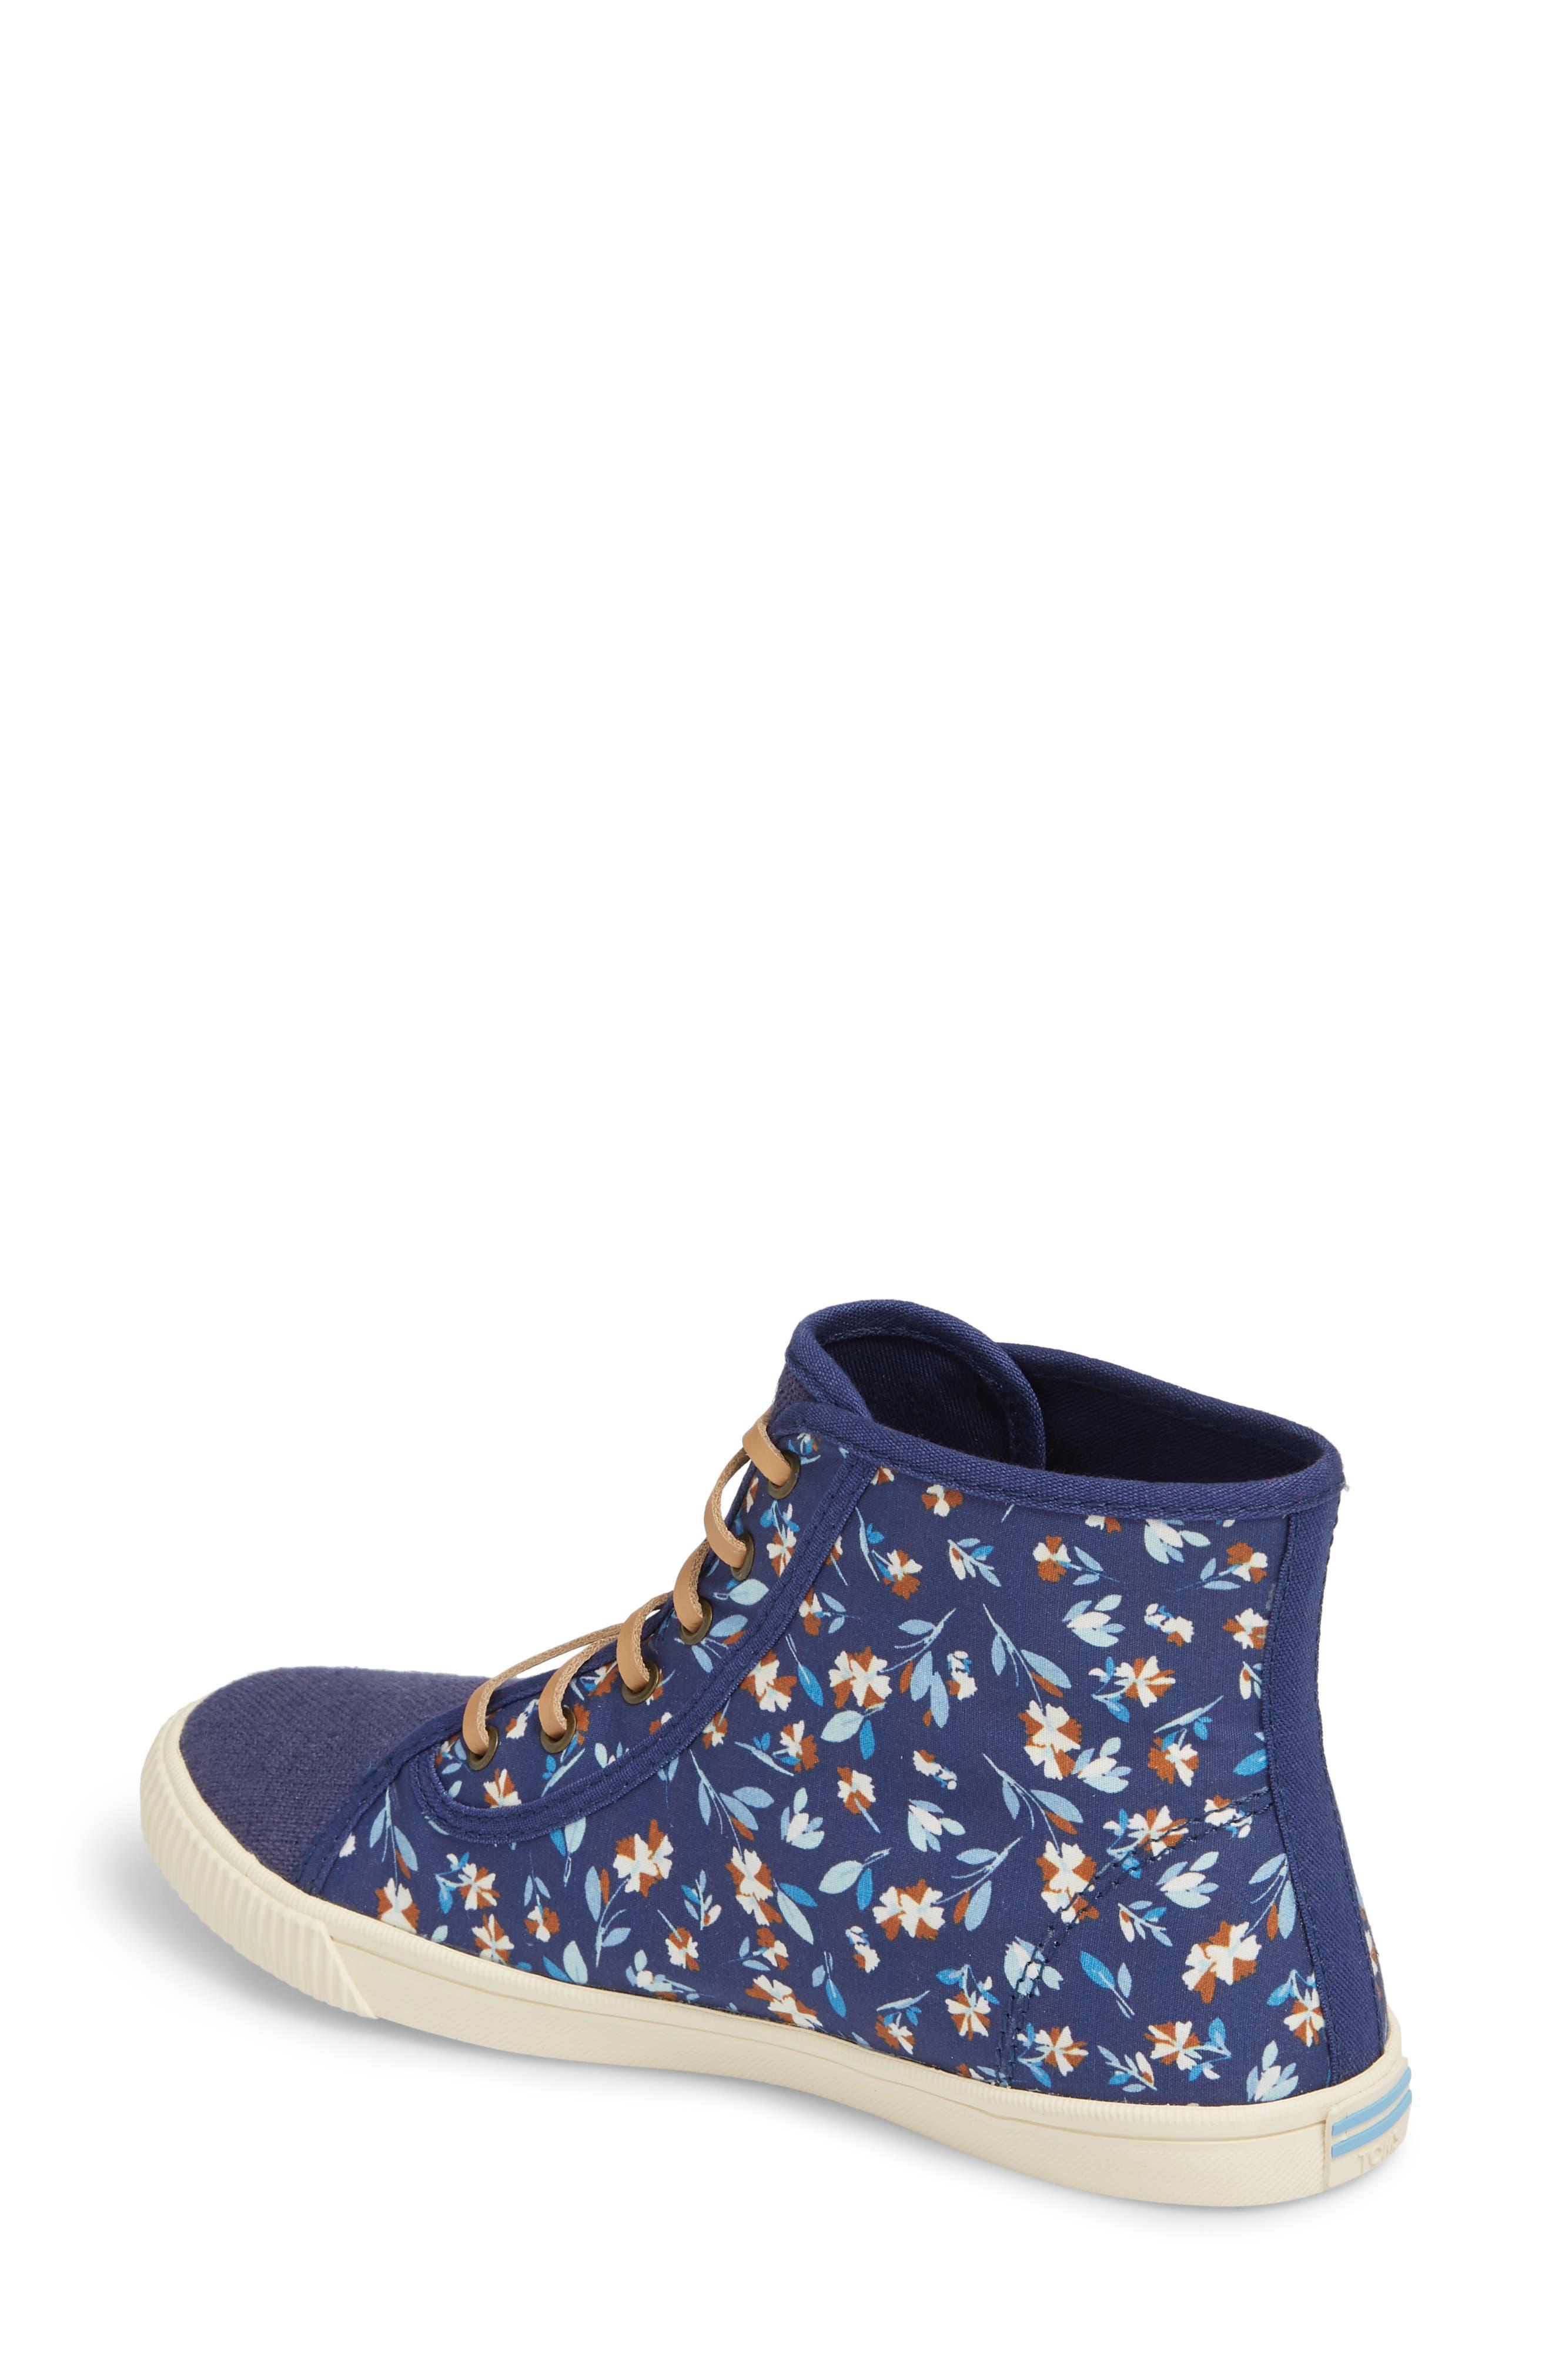 Camarillo High Top Sneaker,                             Alternate thumbnail 2, color,                             Deep Blue Vintage Flower